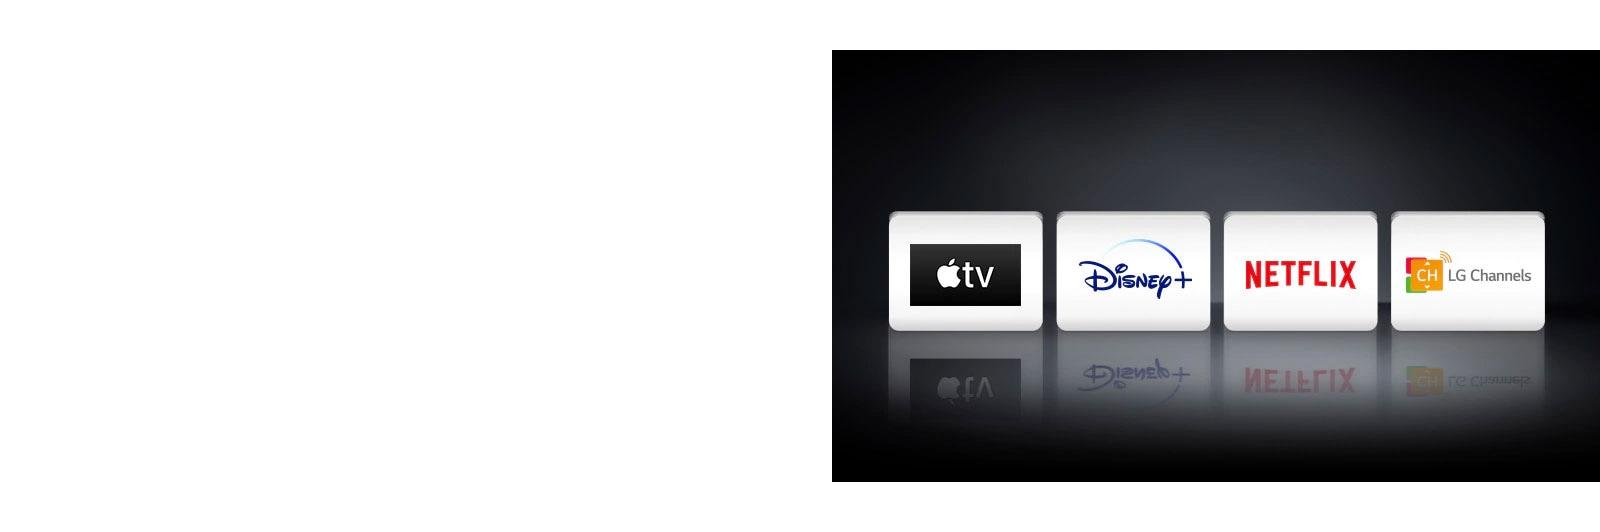 Quattro loghi: Apple TV, Disney+, Netflix e LG Channels